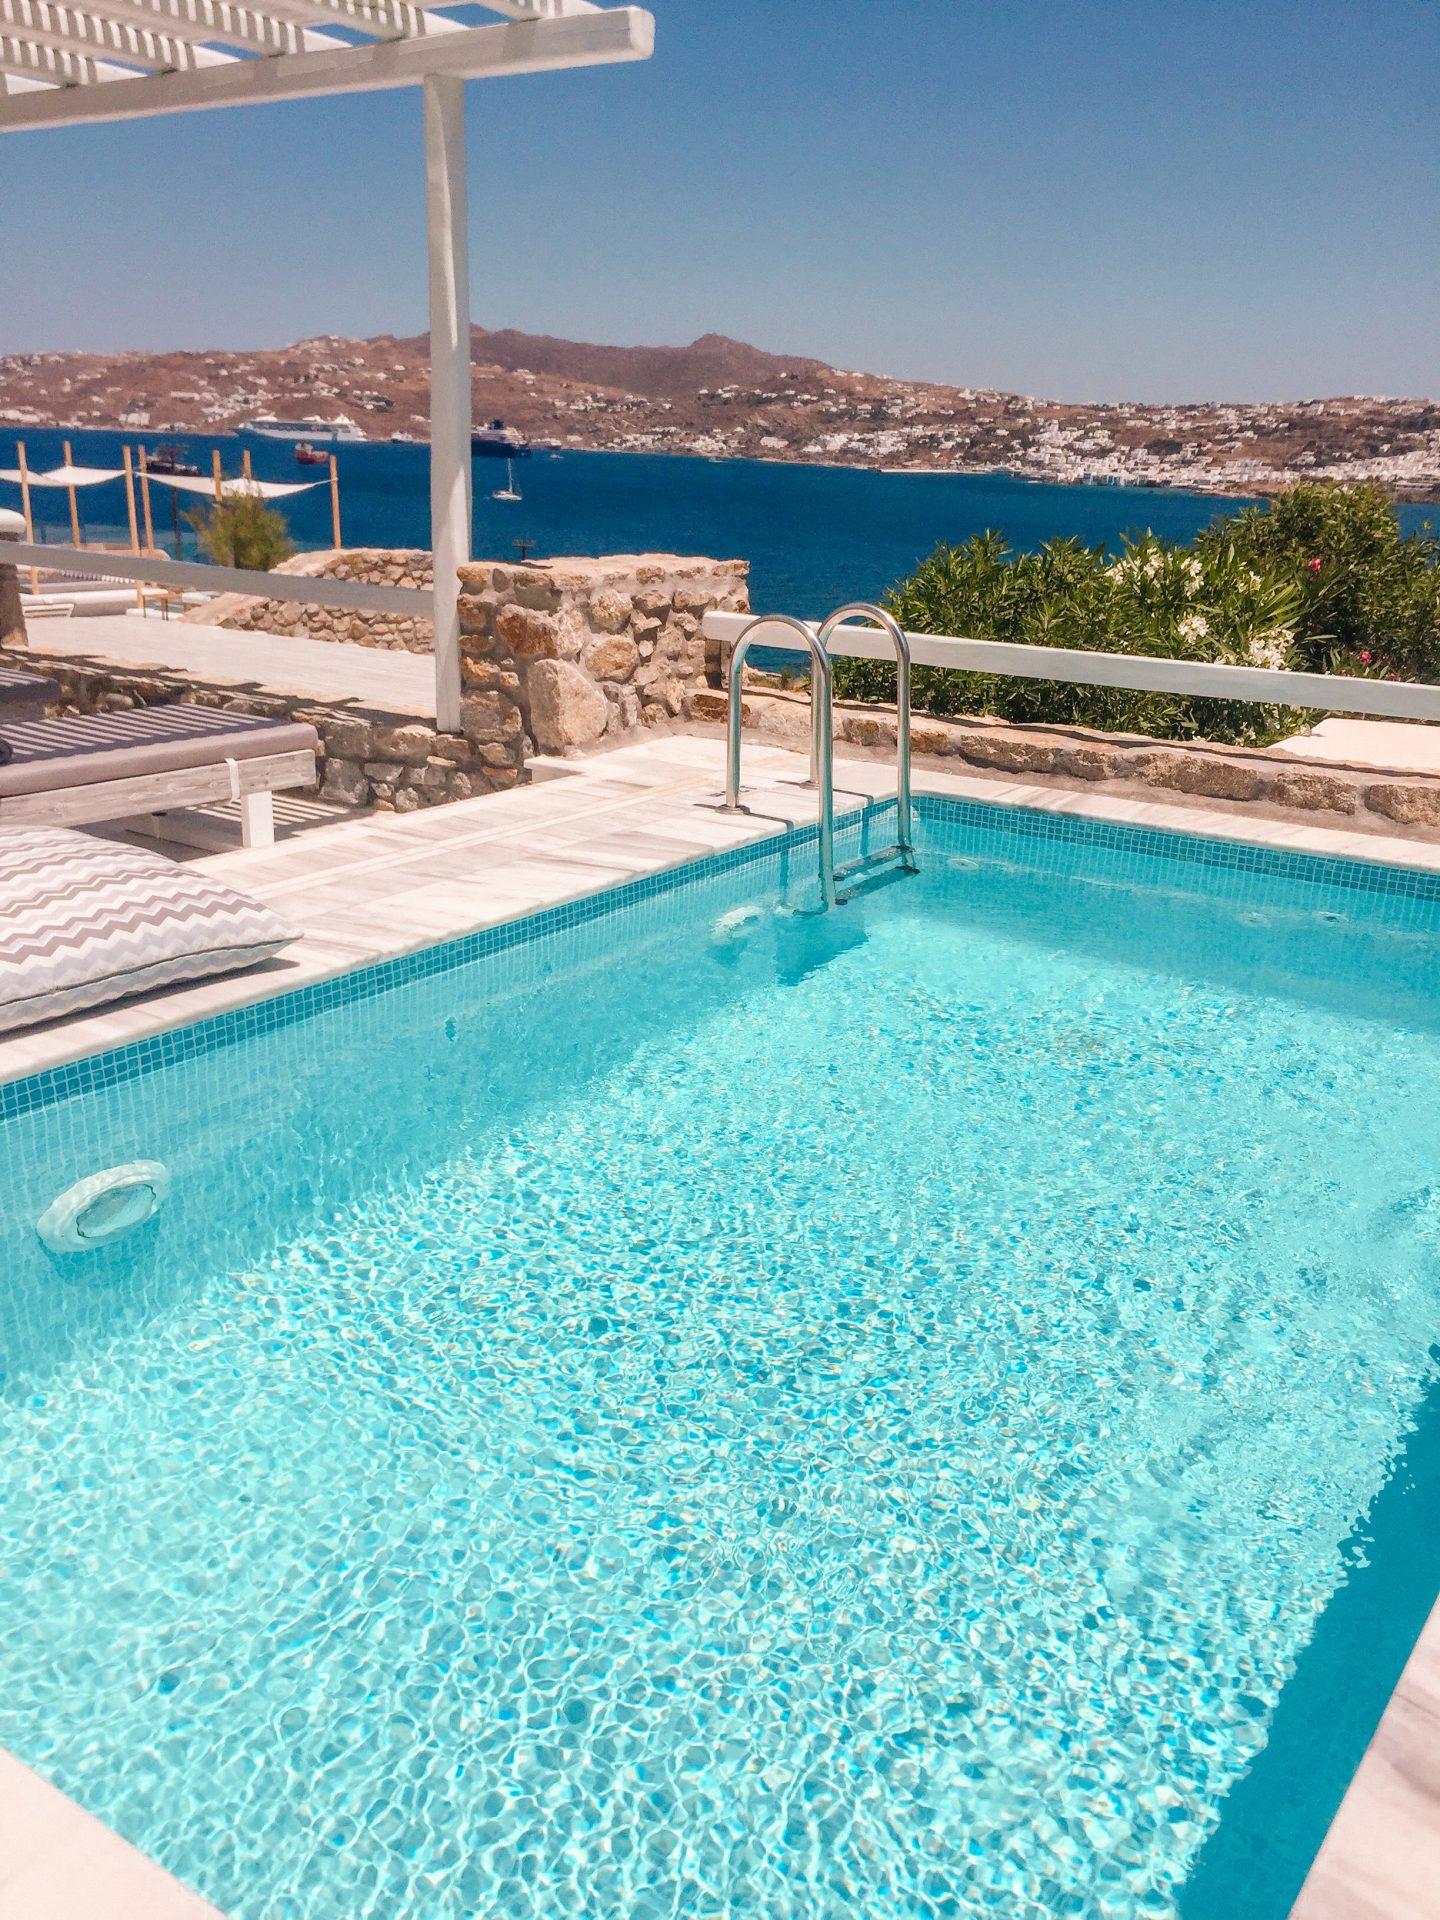 Hotel Mykonos No5 while on Mykonos Island in Greece visiting